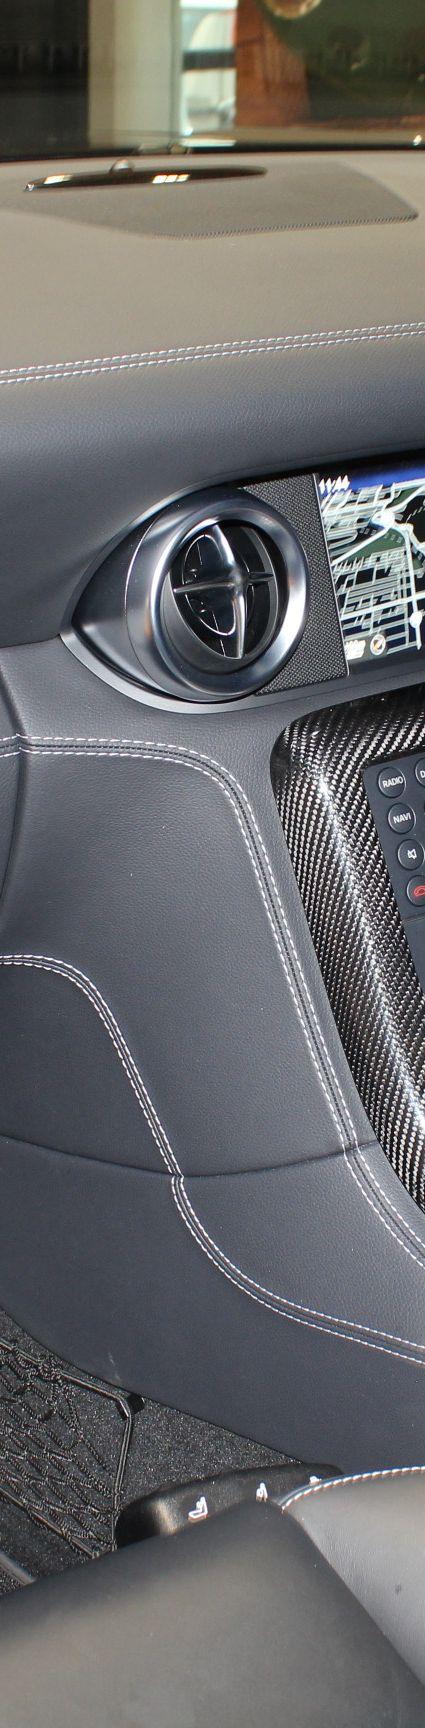 2011 MERCEDES SLS C197 AMG SPEEDSHIFT DCT - for sale in Australia